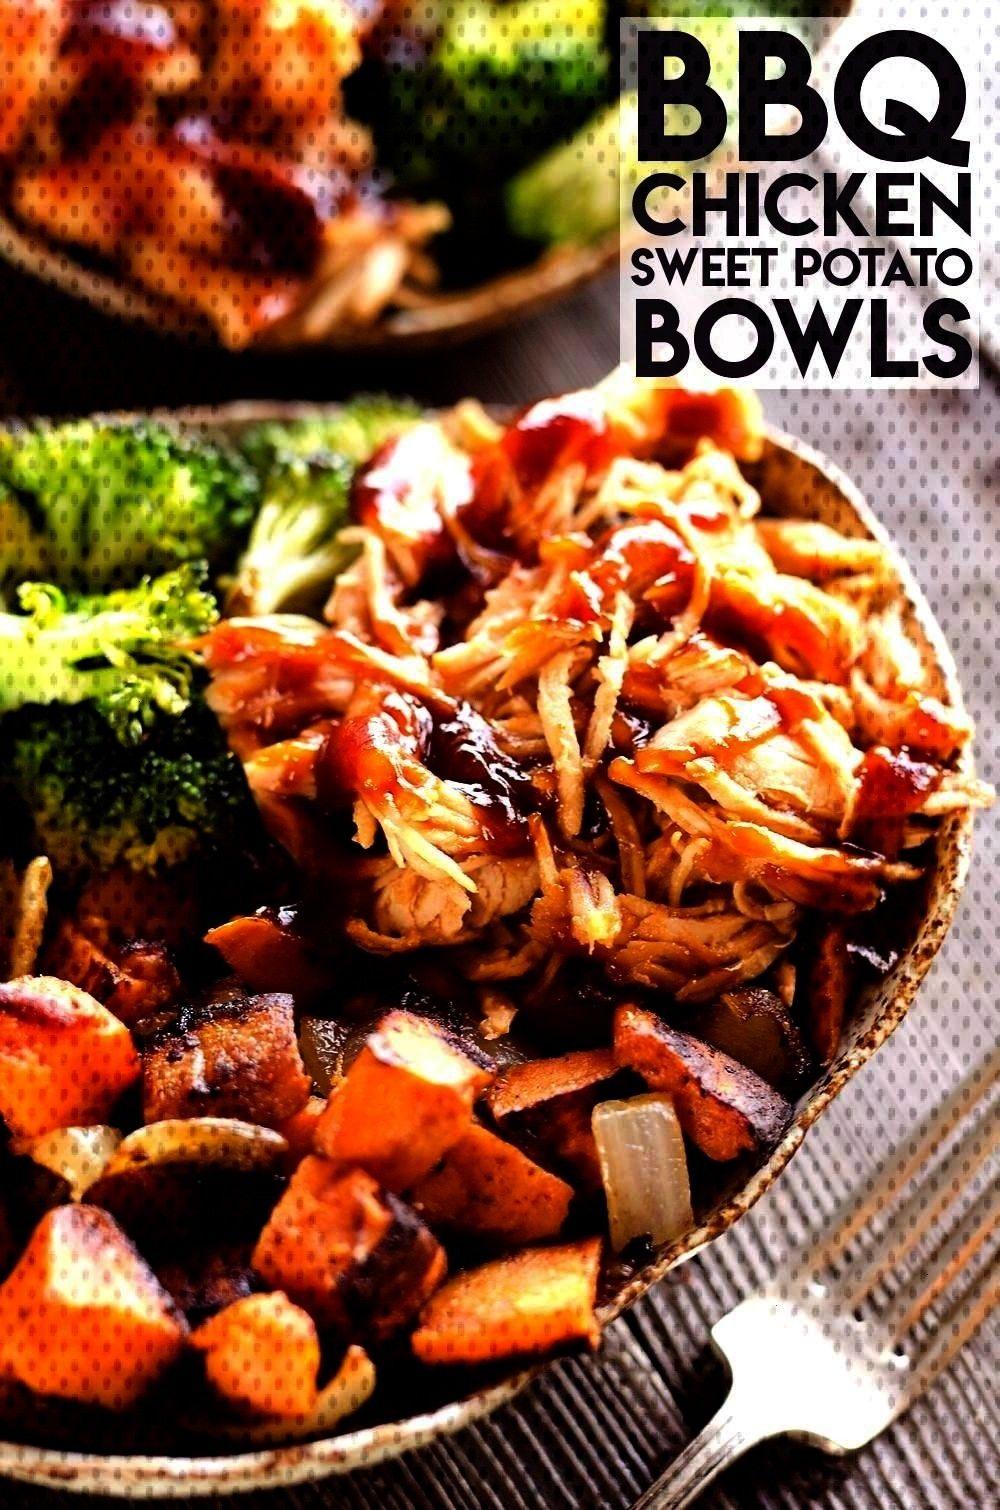 amp Roasted Sweet Potato Bowls BBQ Chicken amp Roasted Sweet Potato Bowls are a hearty andBBQ Chicken